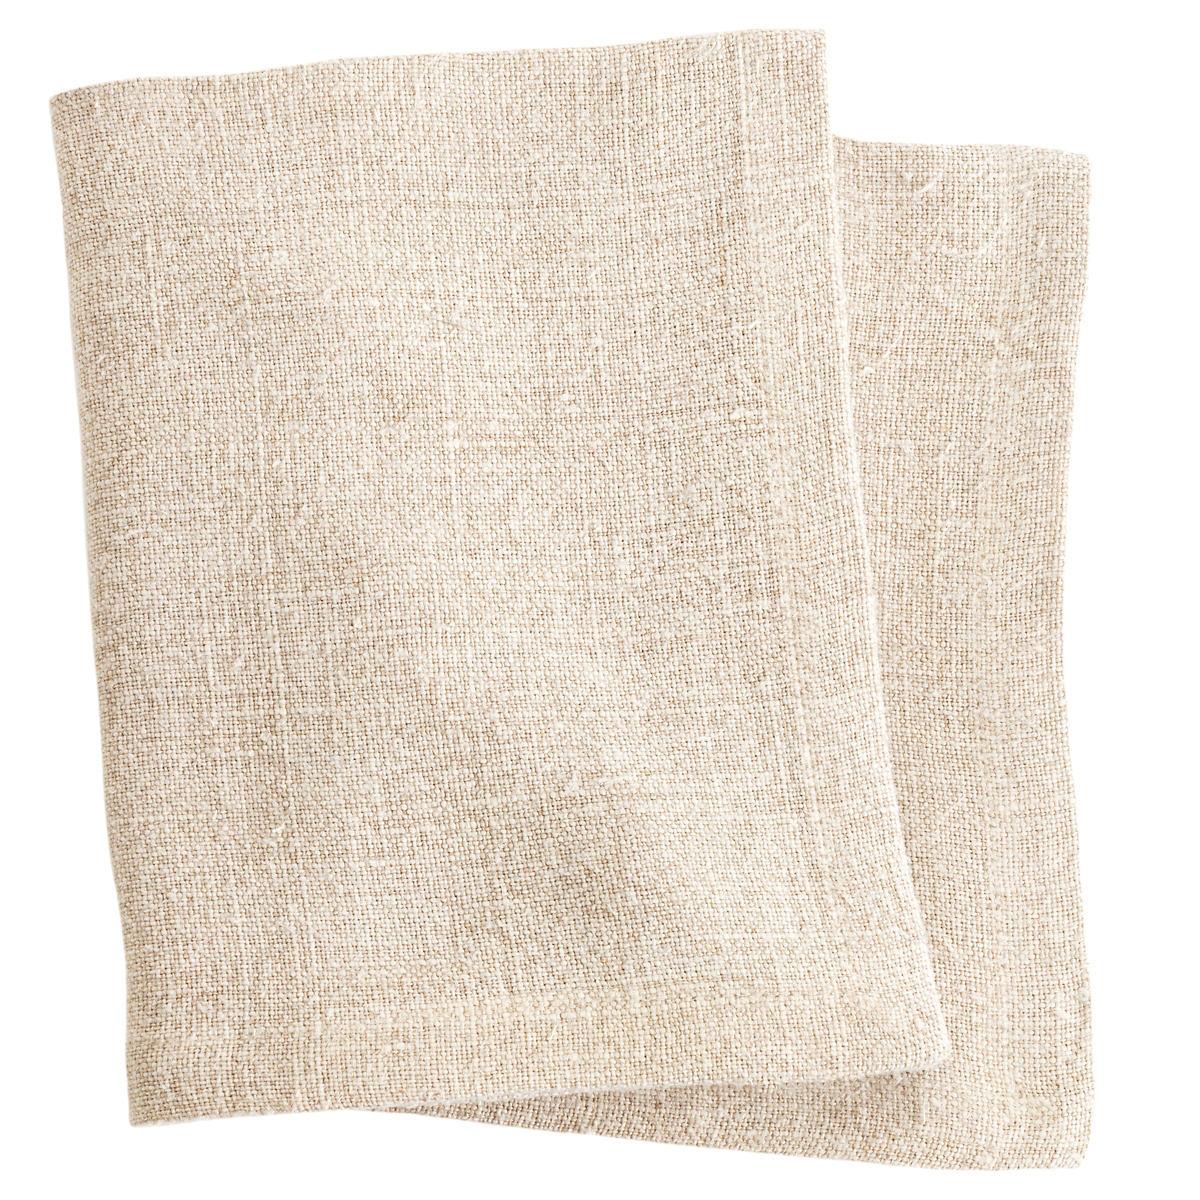 Stone Washed Linen Natural Napkin Set